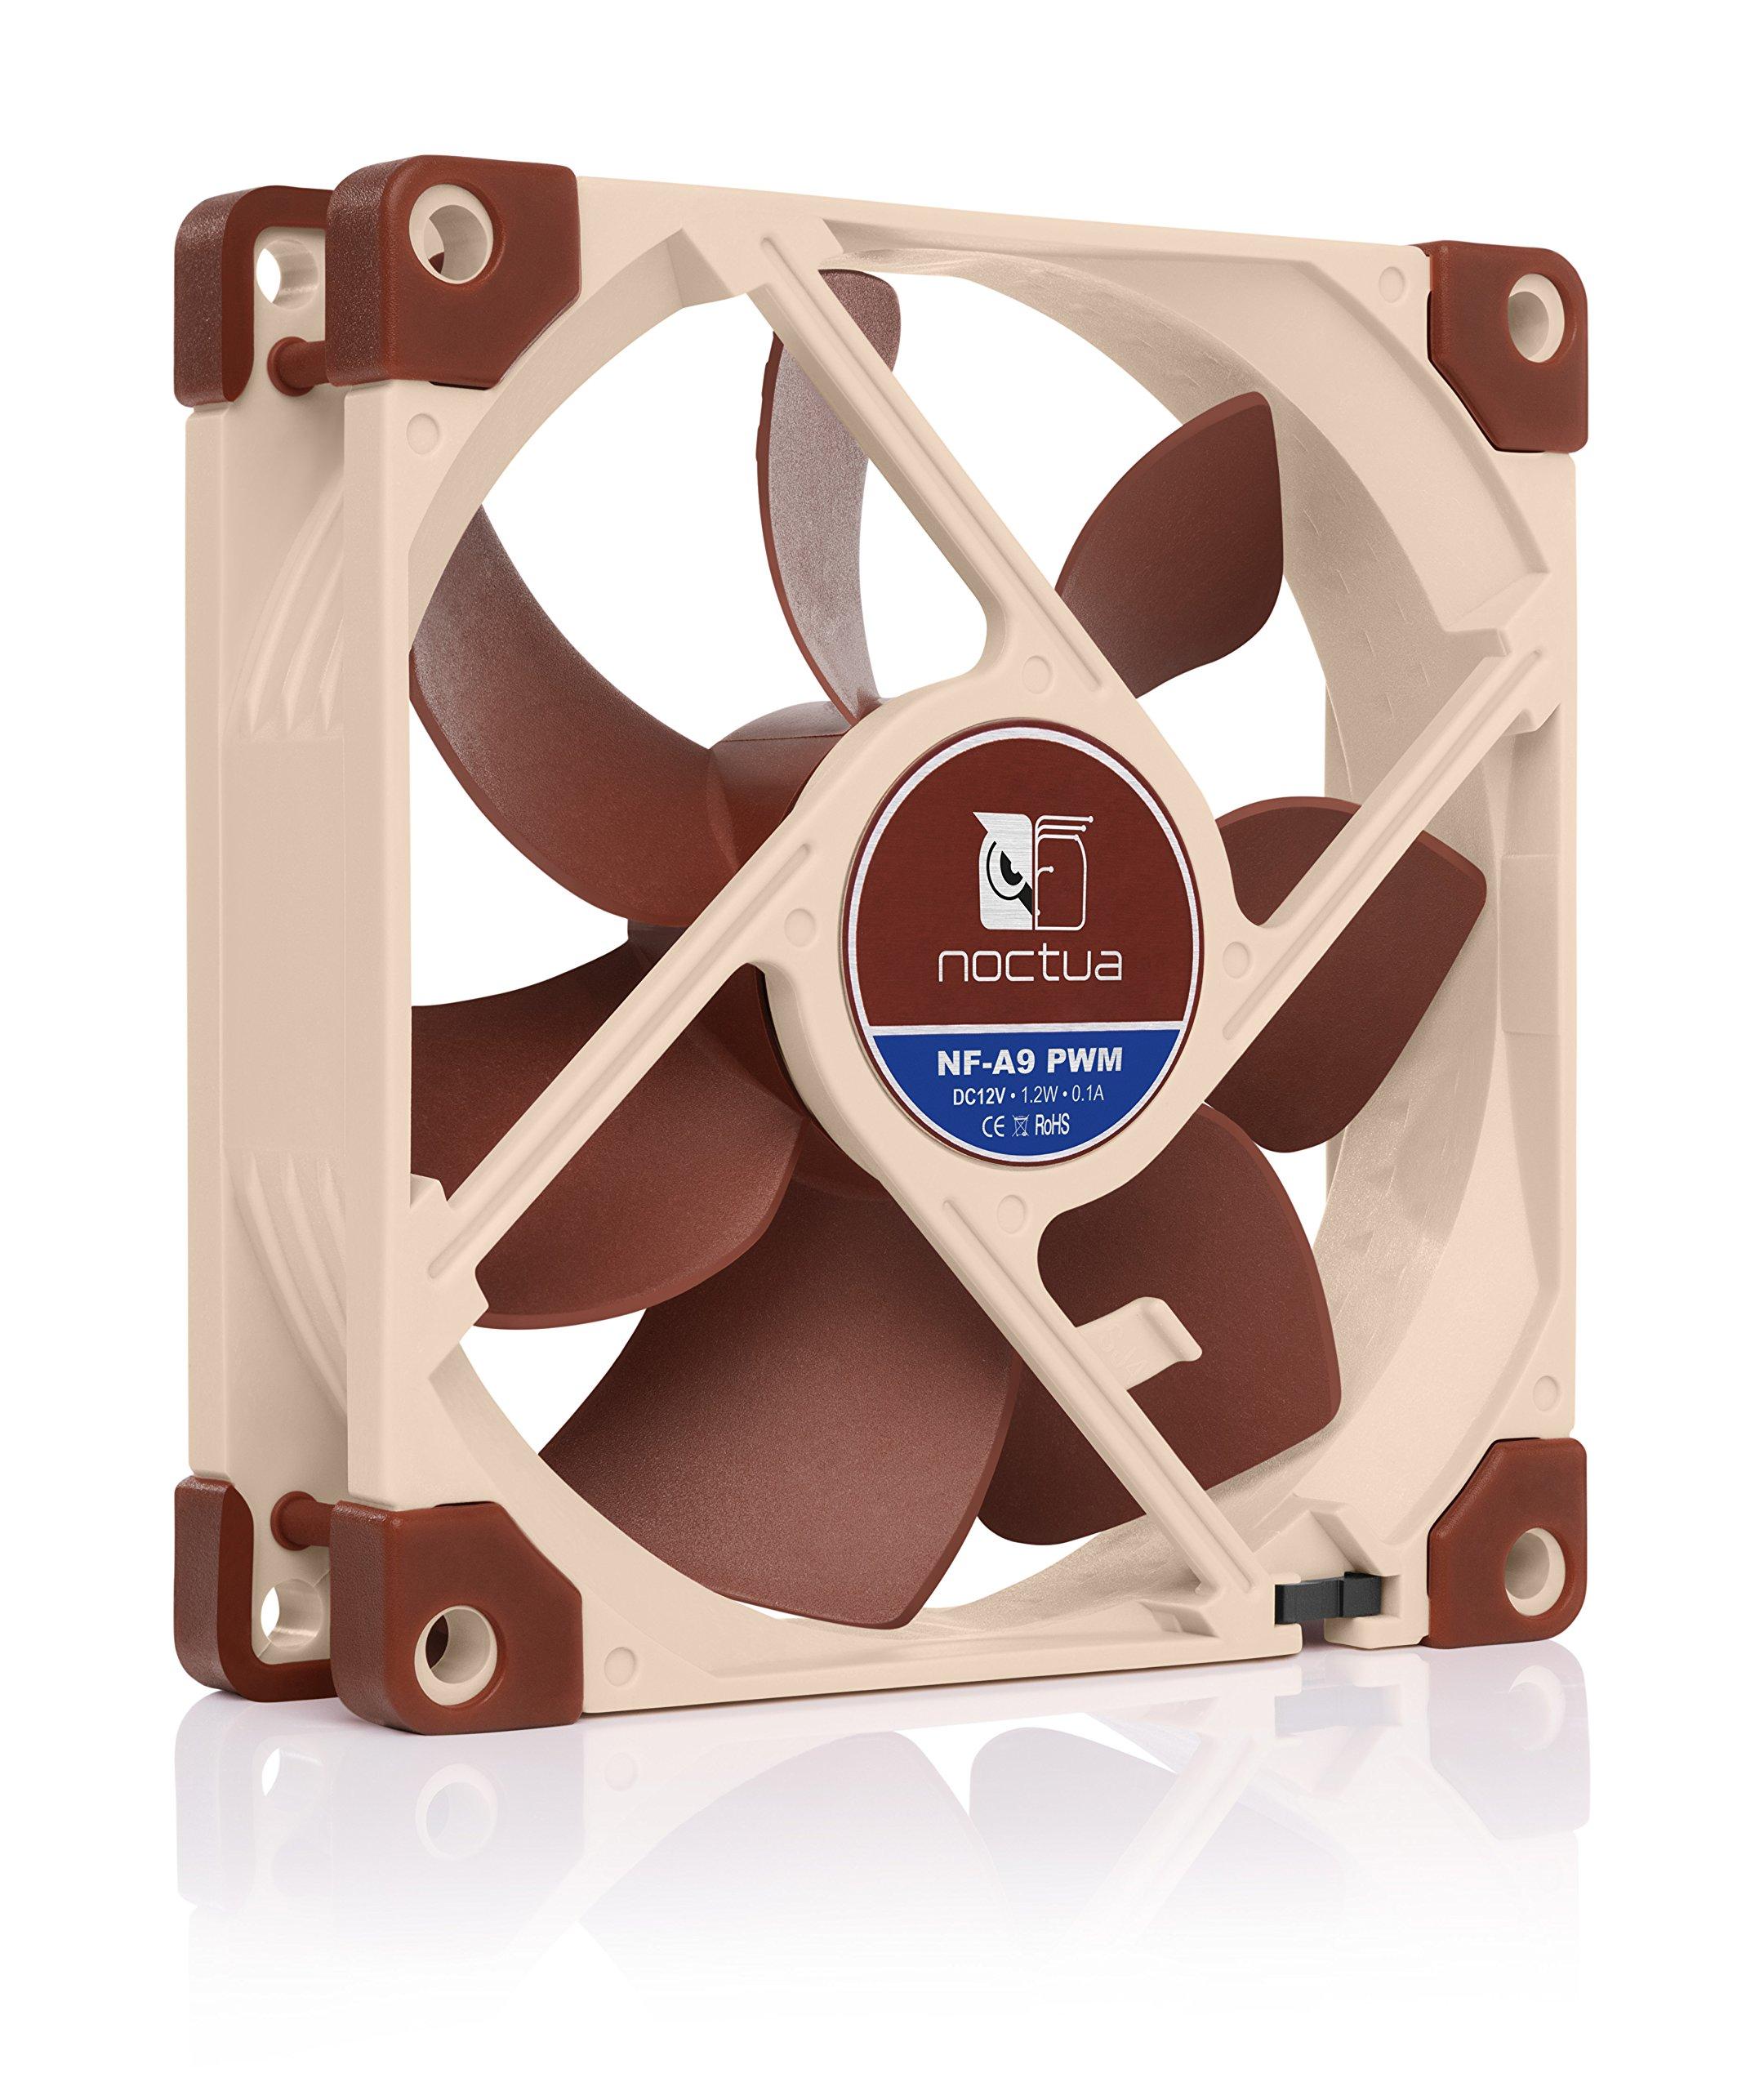 Noctua AAO Frame Design SSO2 Bearing Quiet Fan(NF-A9 PWM) by noctua (Image #2)